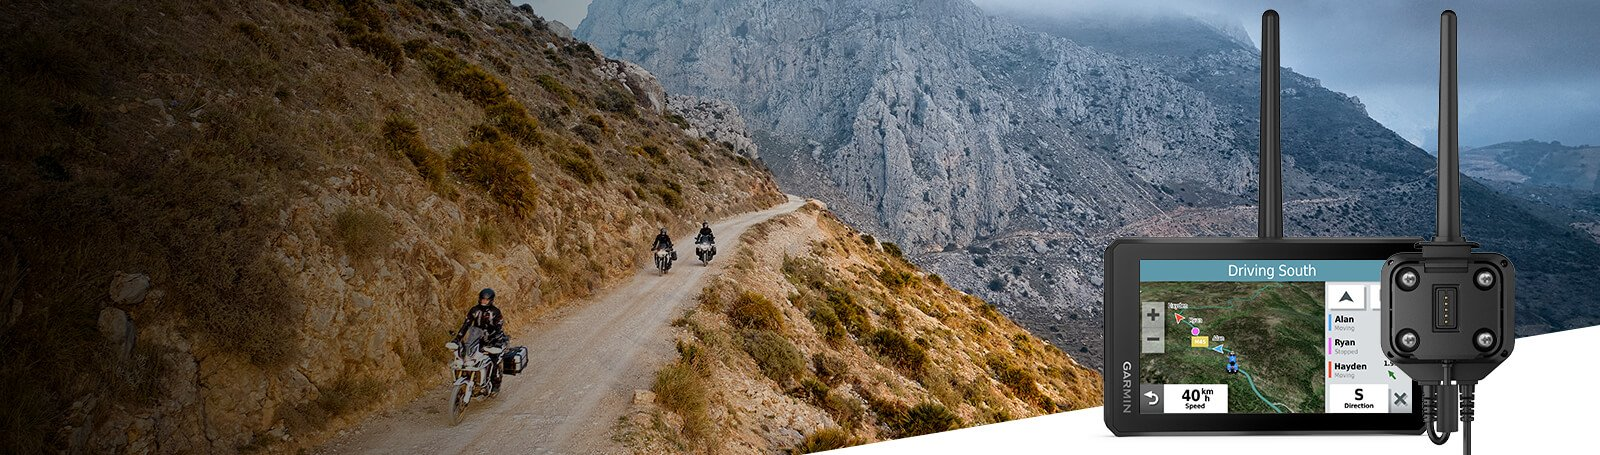 Групповой трекер Garmin Group Ride Tracker